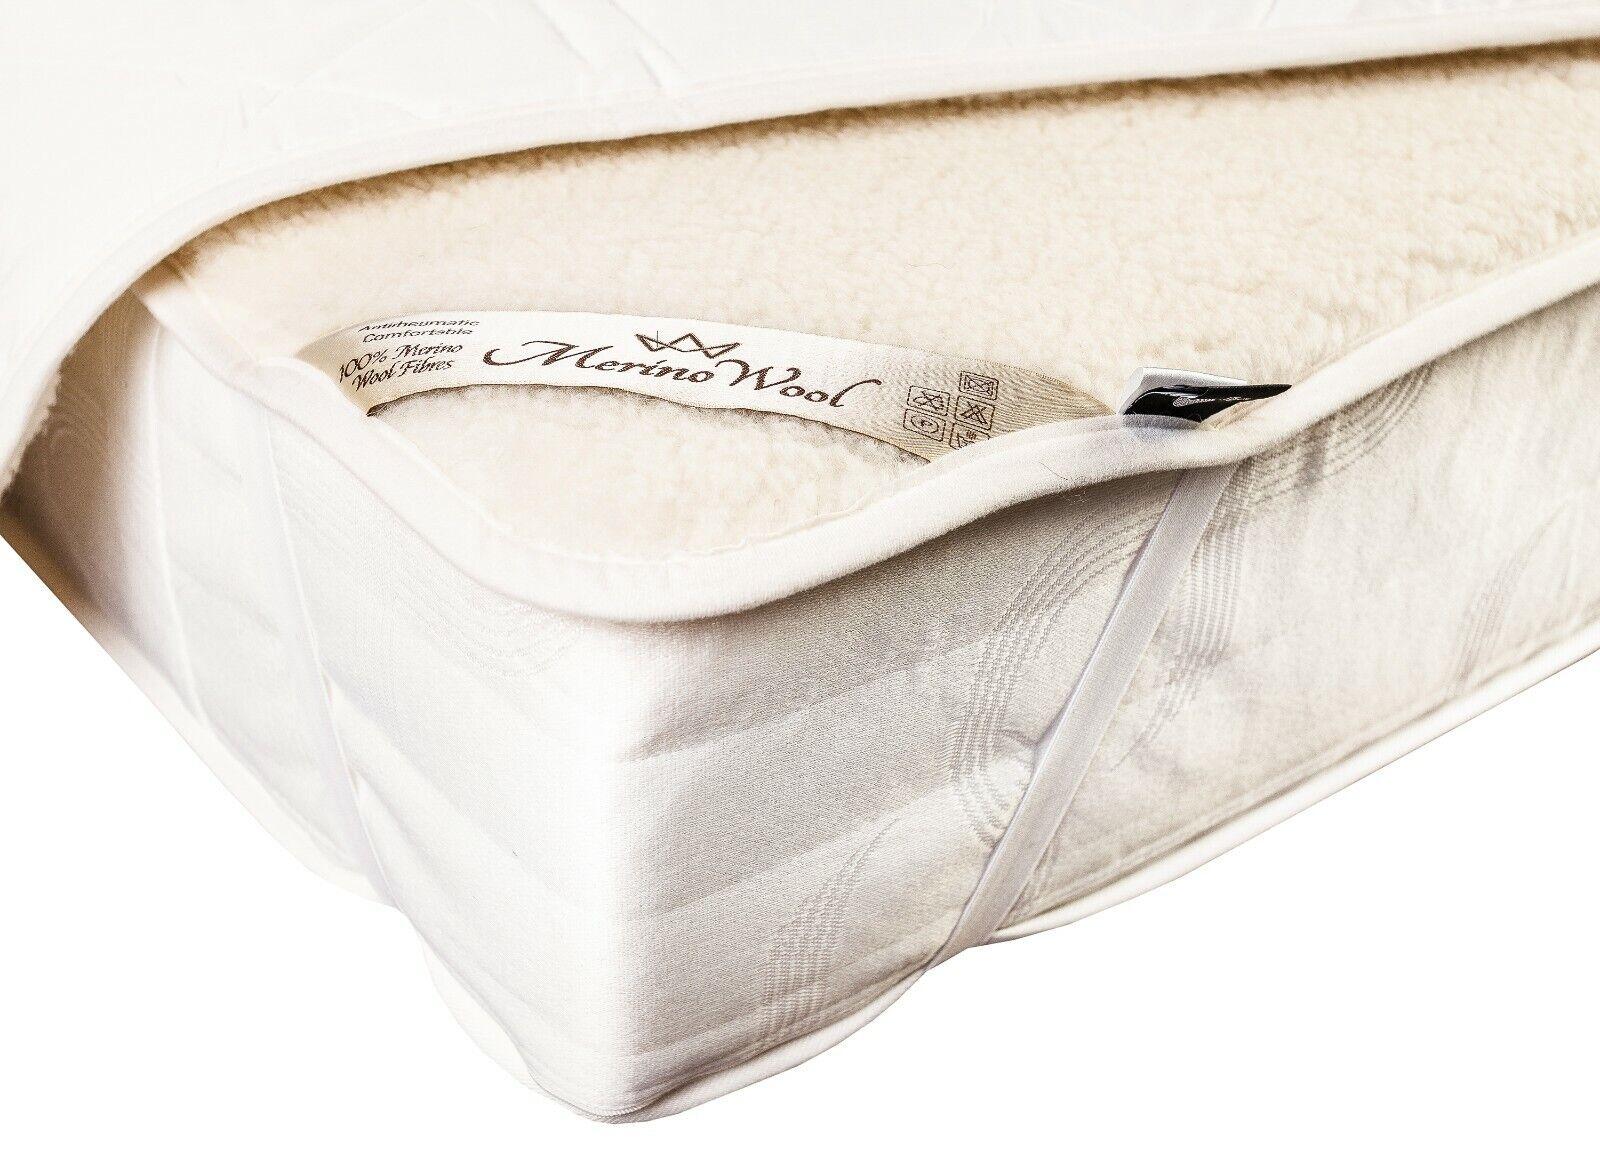 Bedding Pura Lana Merino Perugiano Naturale Coprimaterasso Letto Cover Imbottitura Mattress Pads Feather Beds